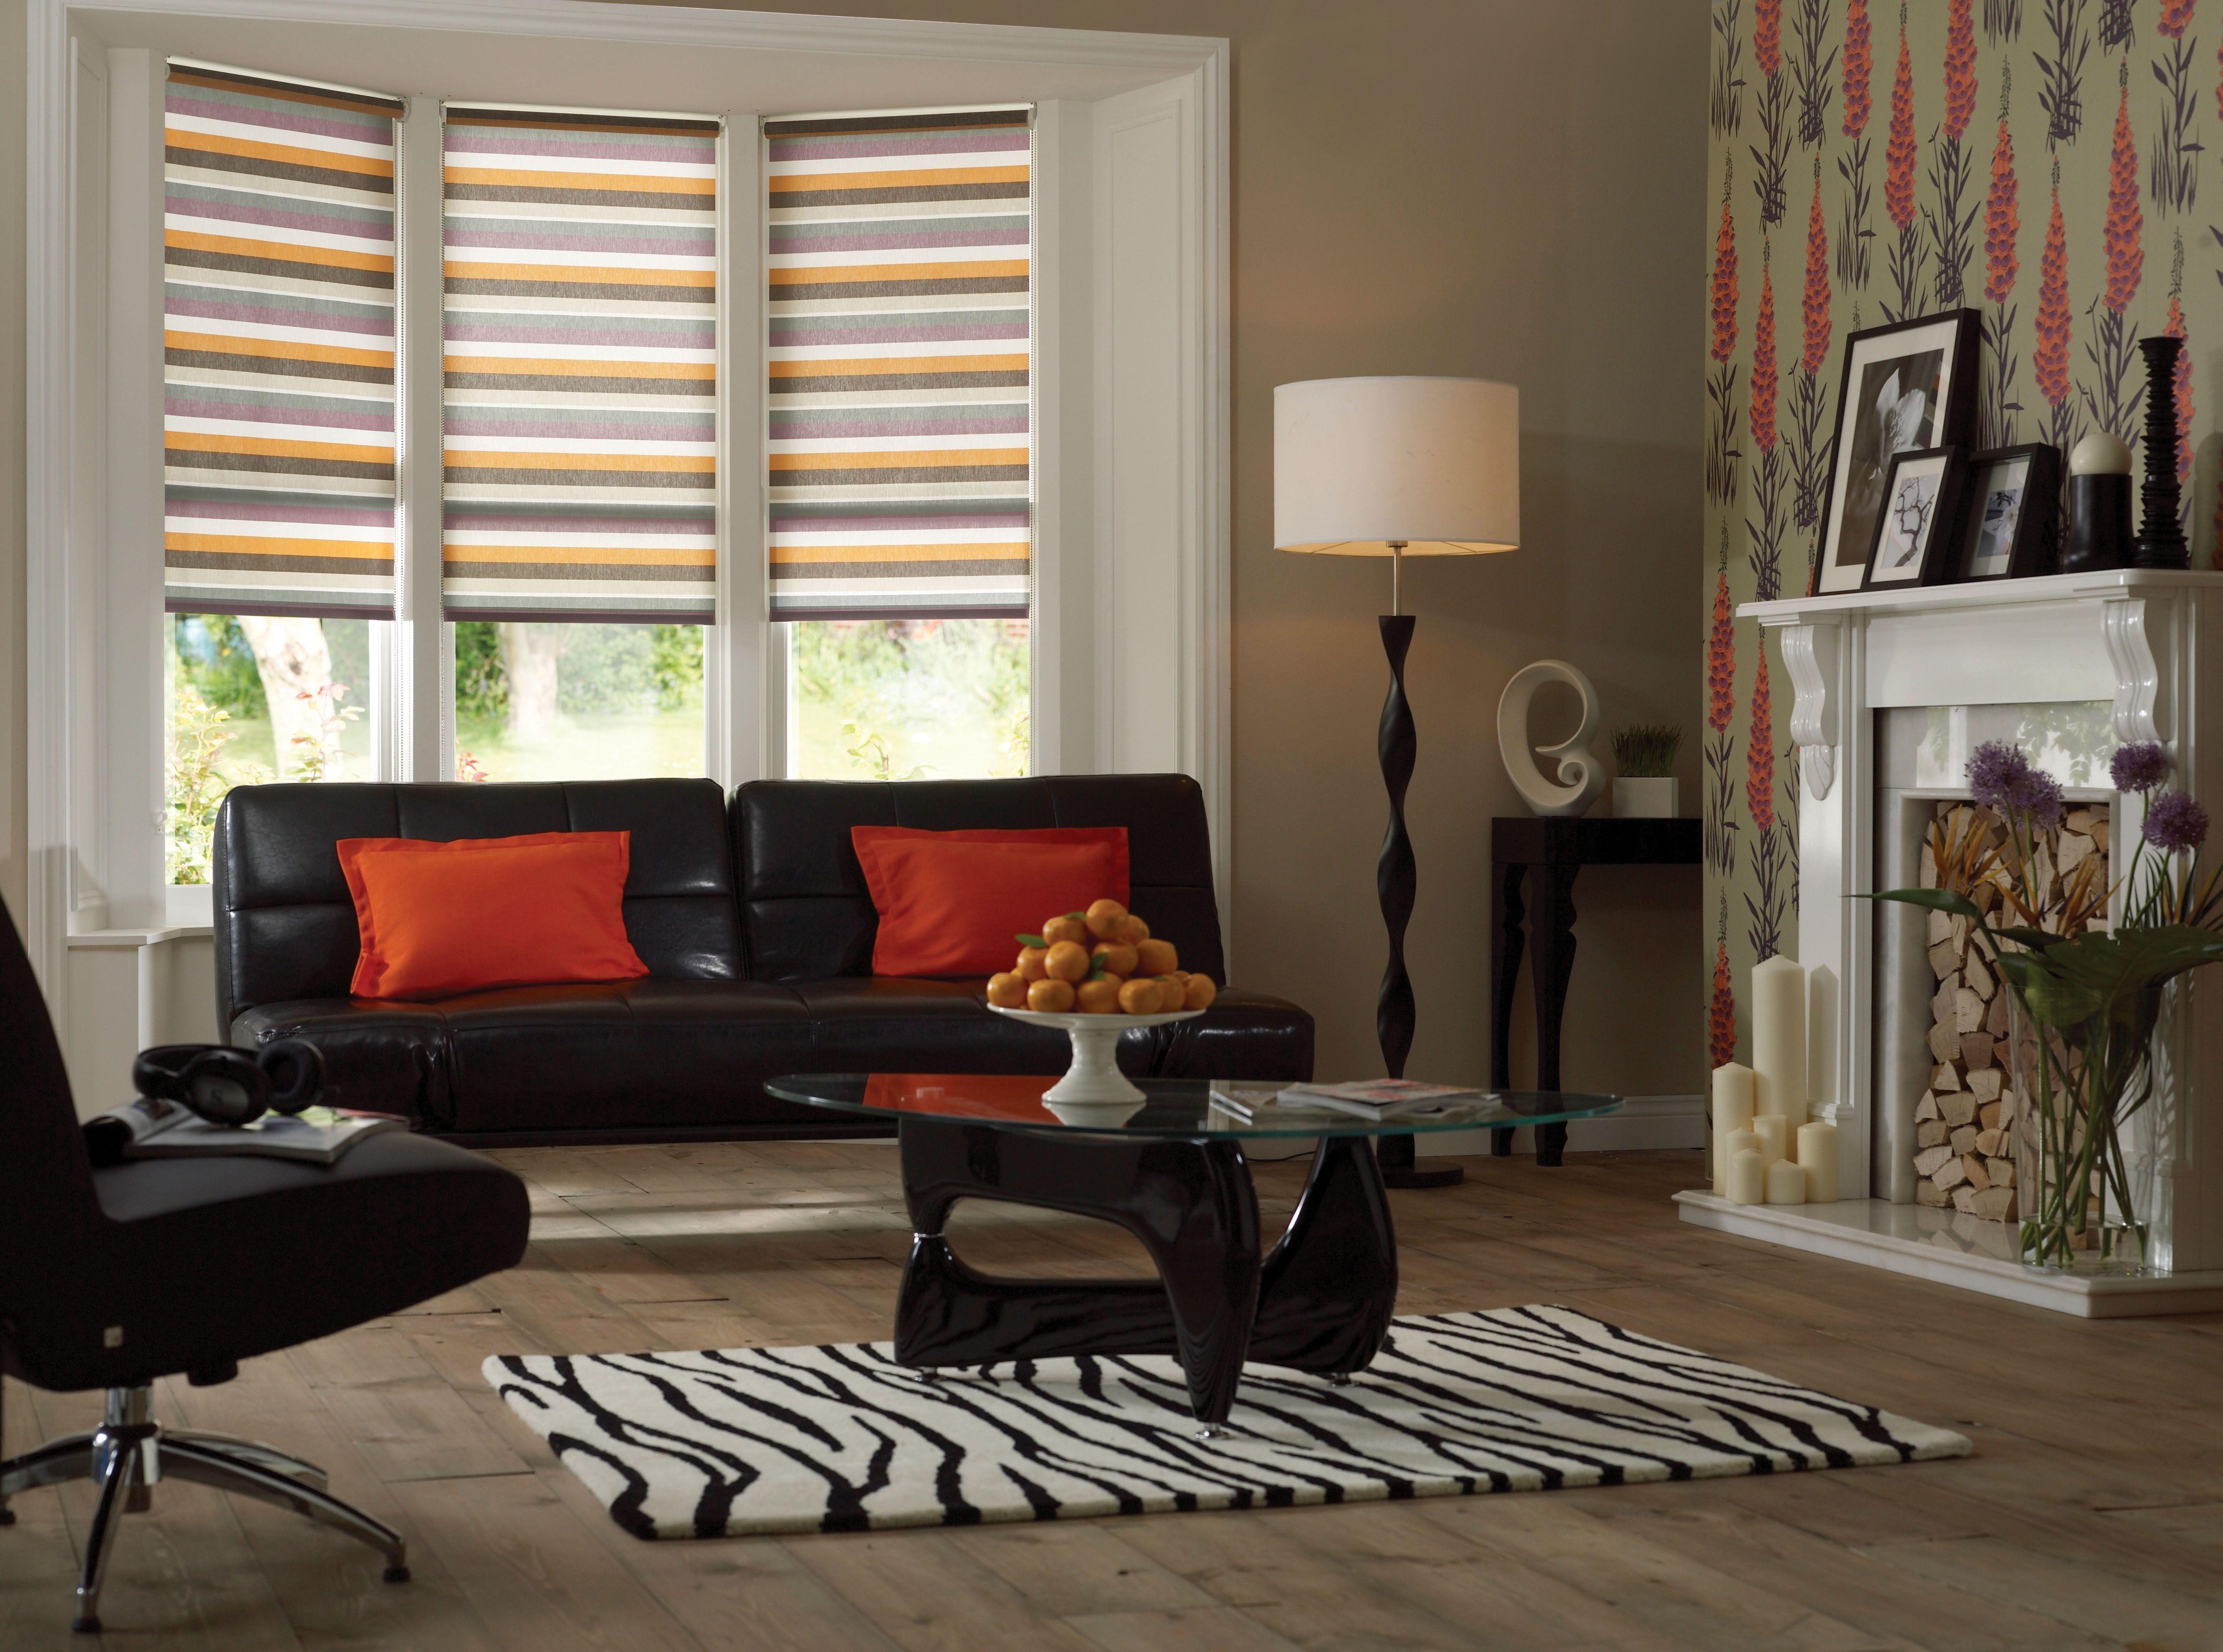 Living Room Window Blinds   Living Room Design Ideas